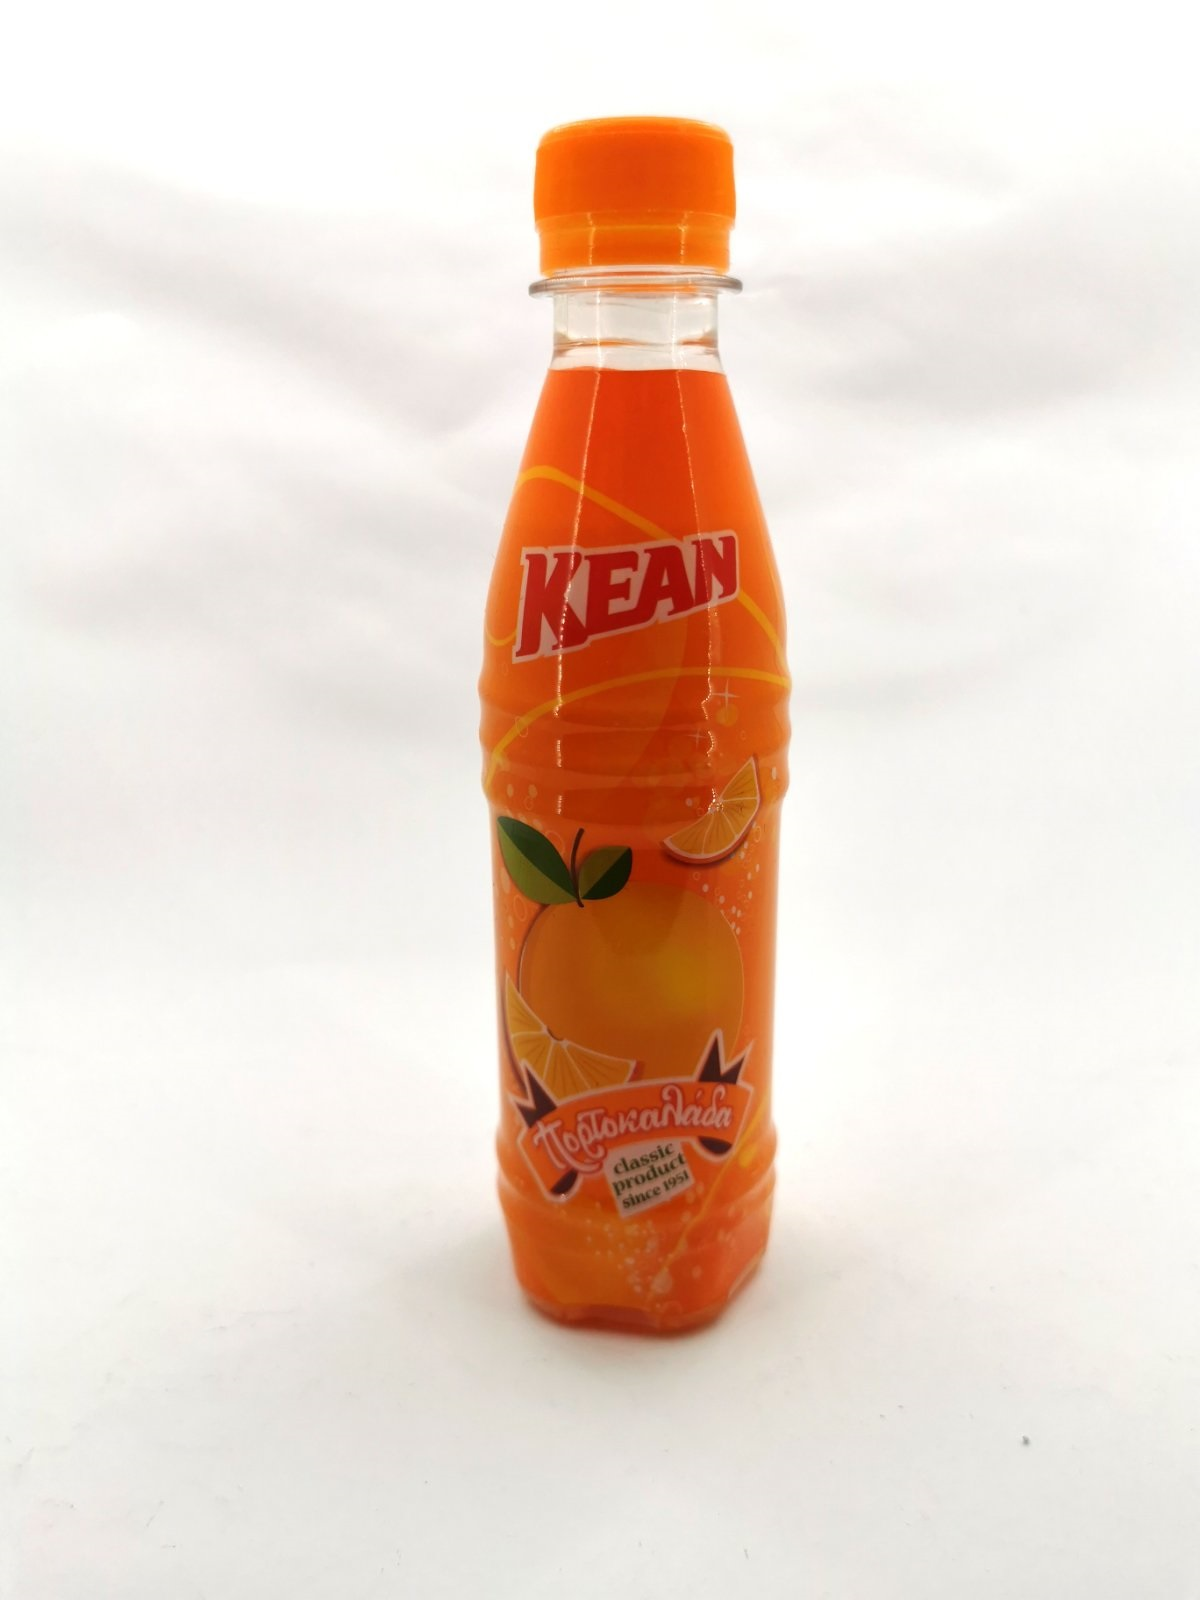 KEAN ORANGEADE PET 25CL